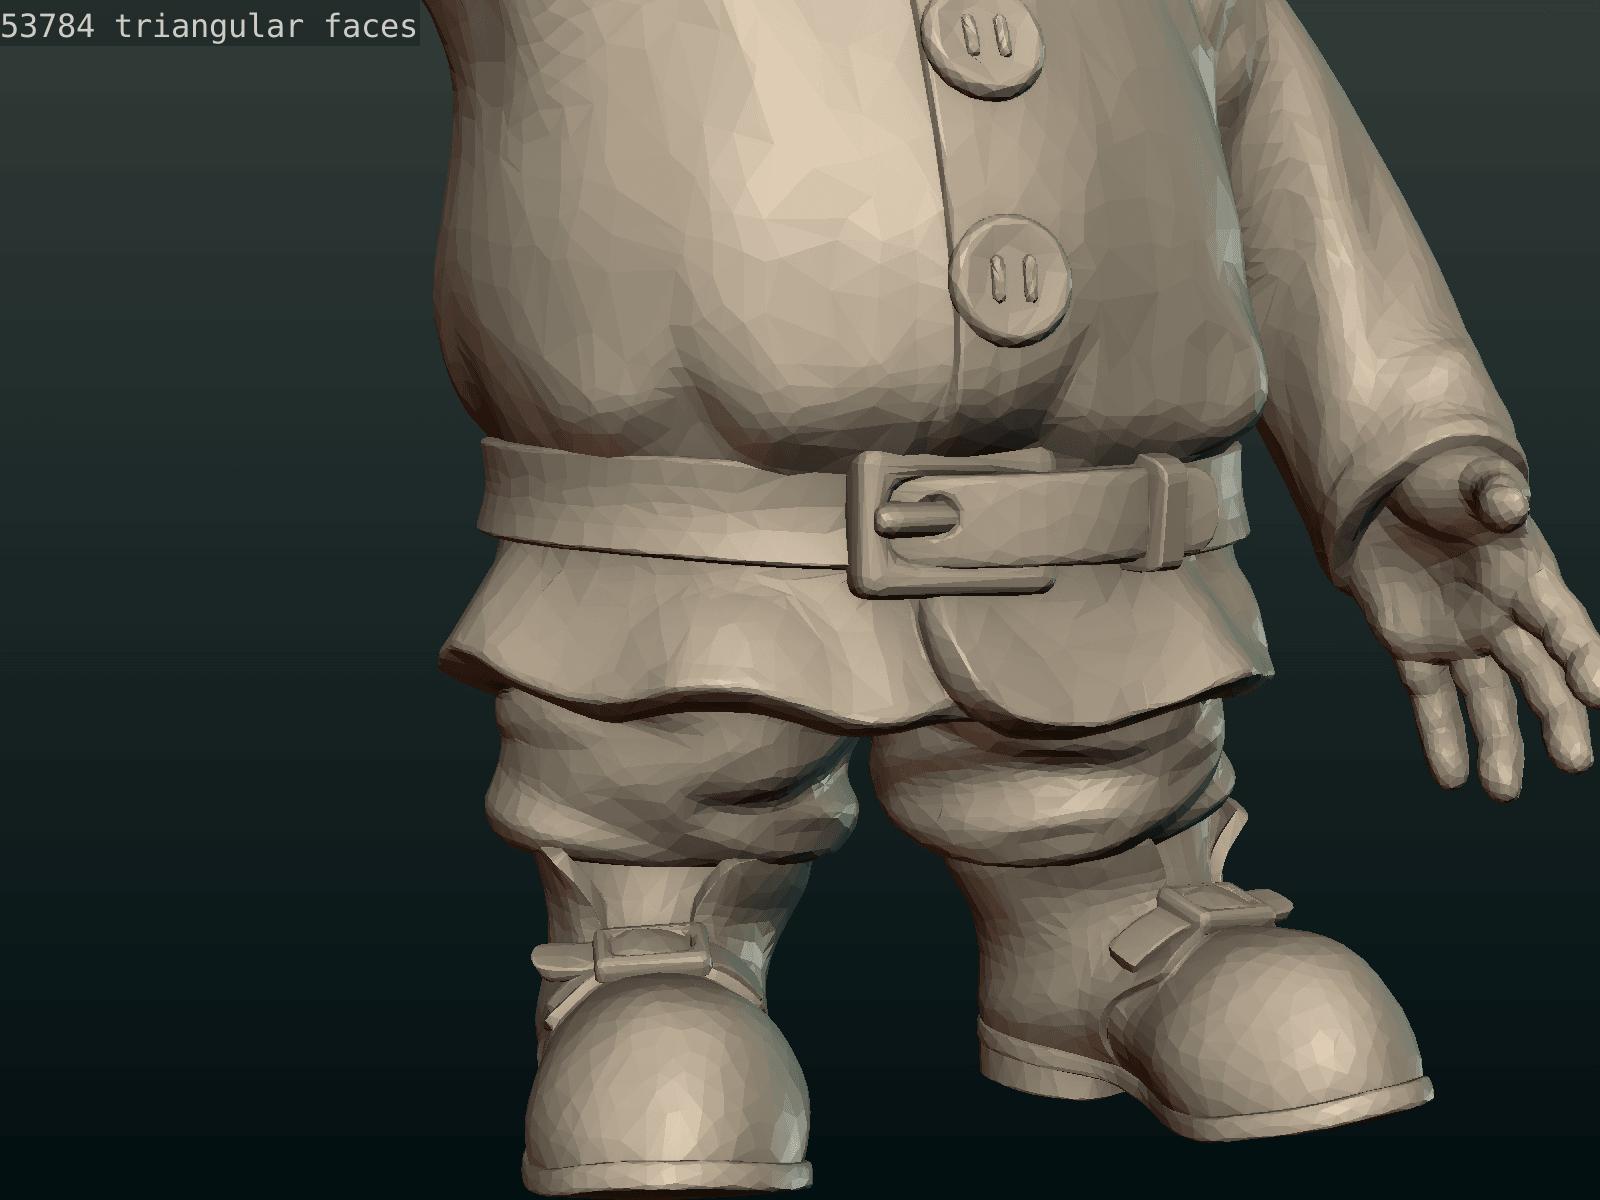 Garden_Gnome-26.png Download STL file Garden Gnome • 3D printing design, Skazok